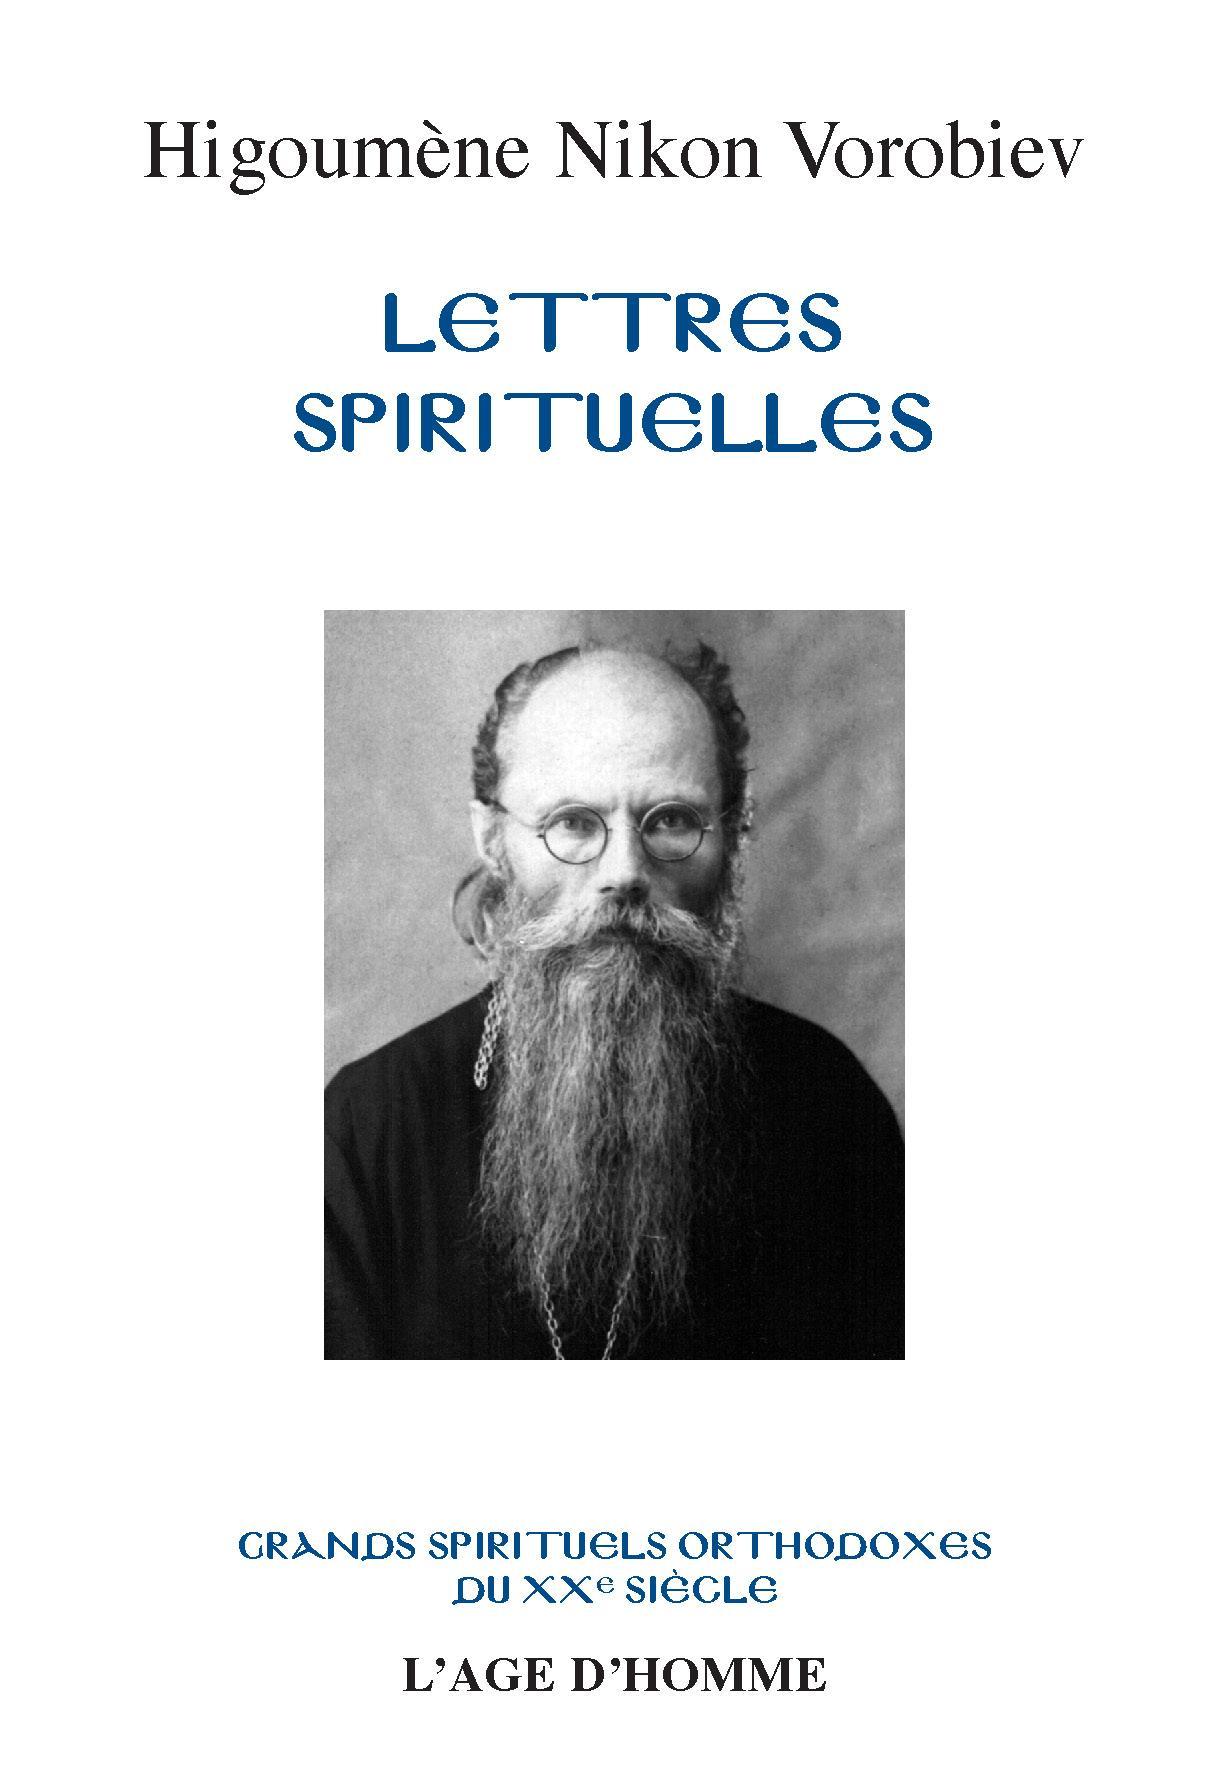 Higoumène Nikon Vorobiev - Lettres spirituelles